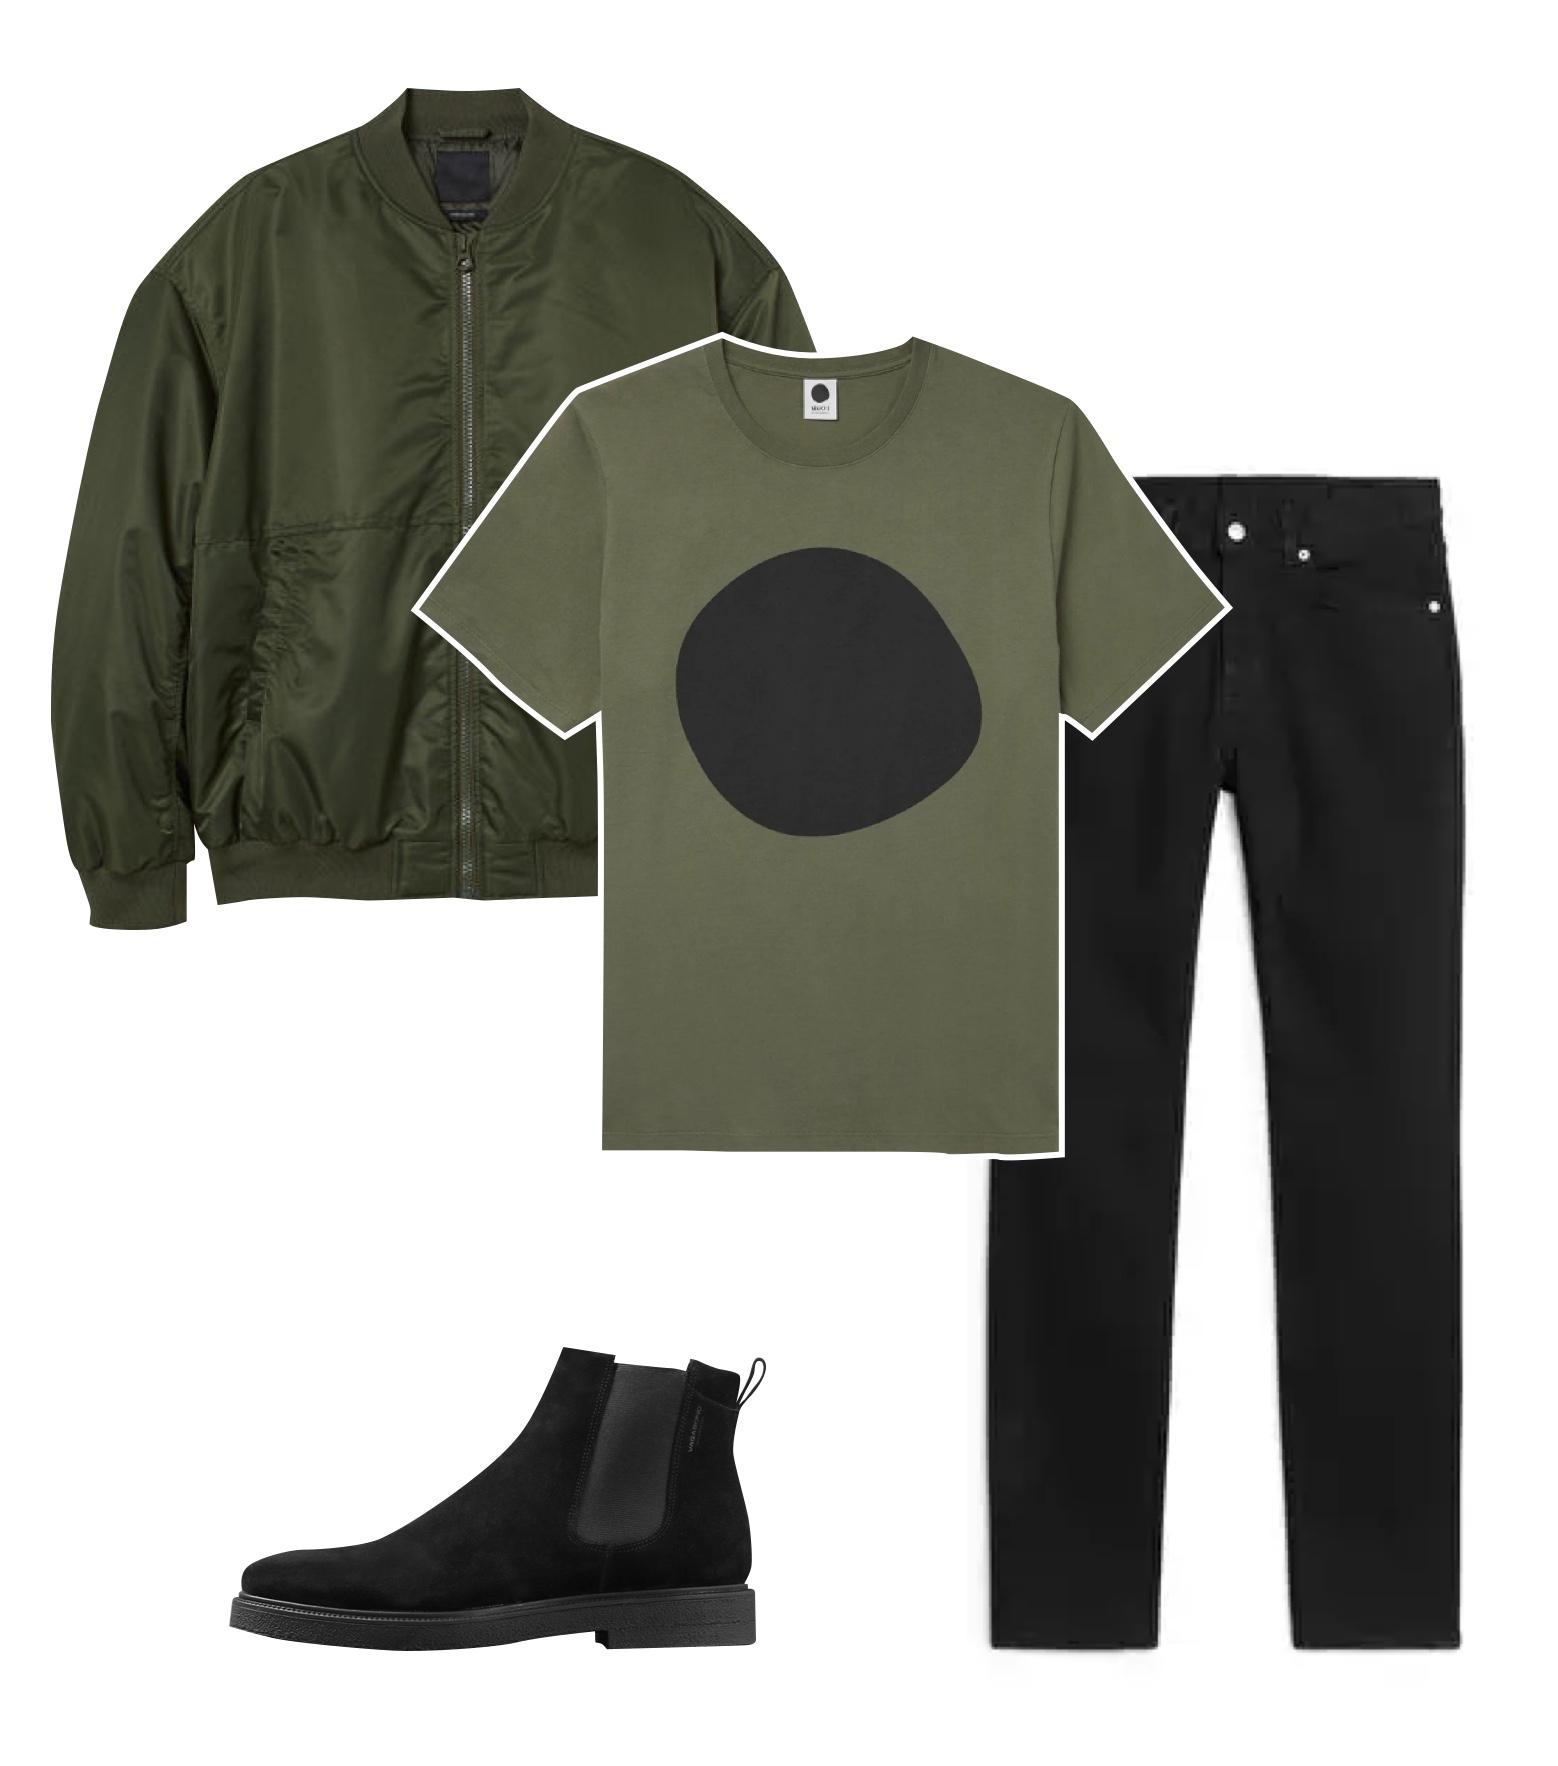 Бомбер H&M, 7499 рублей; футболка NN07, €47; джинсы Arket, $79; челси Vagabond, 10500 рублей